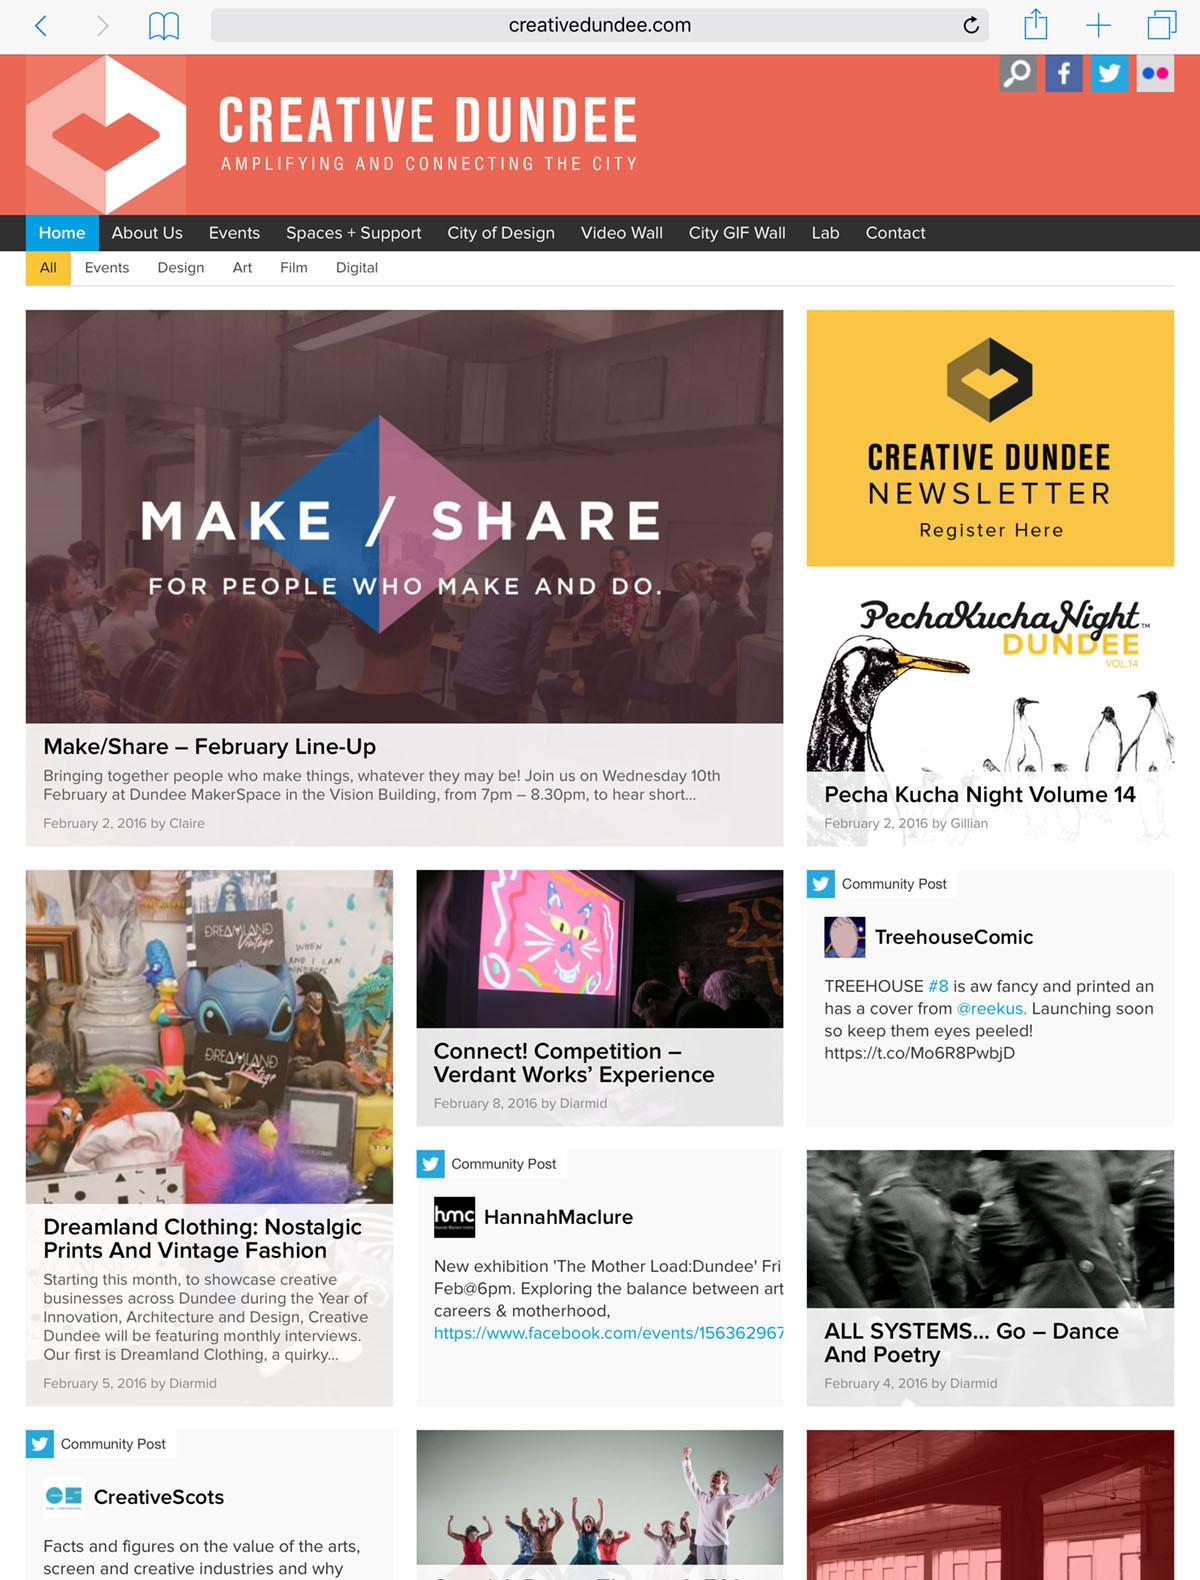 Creative Dundee Website